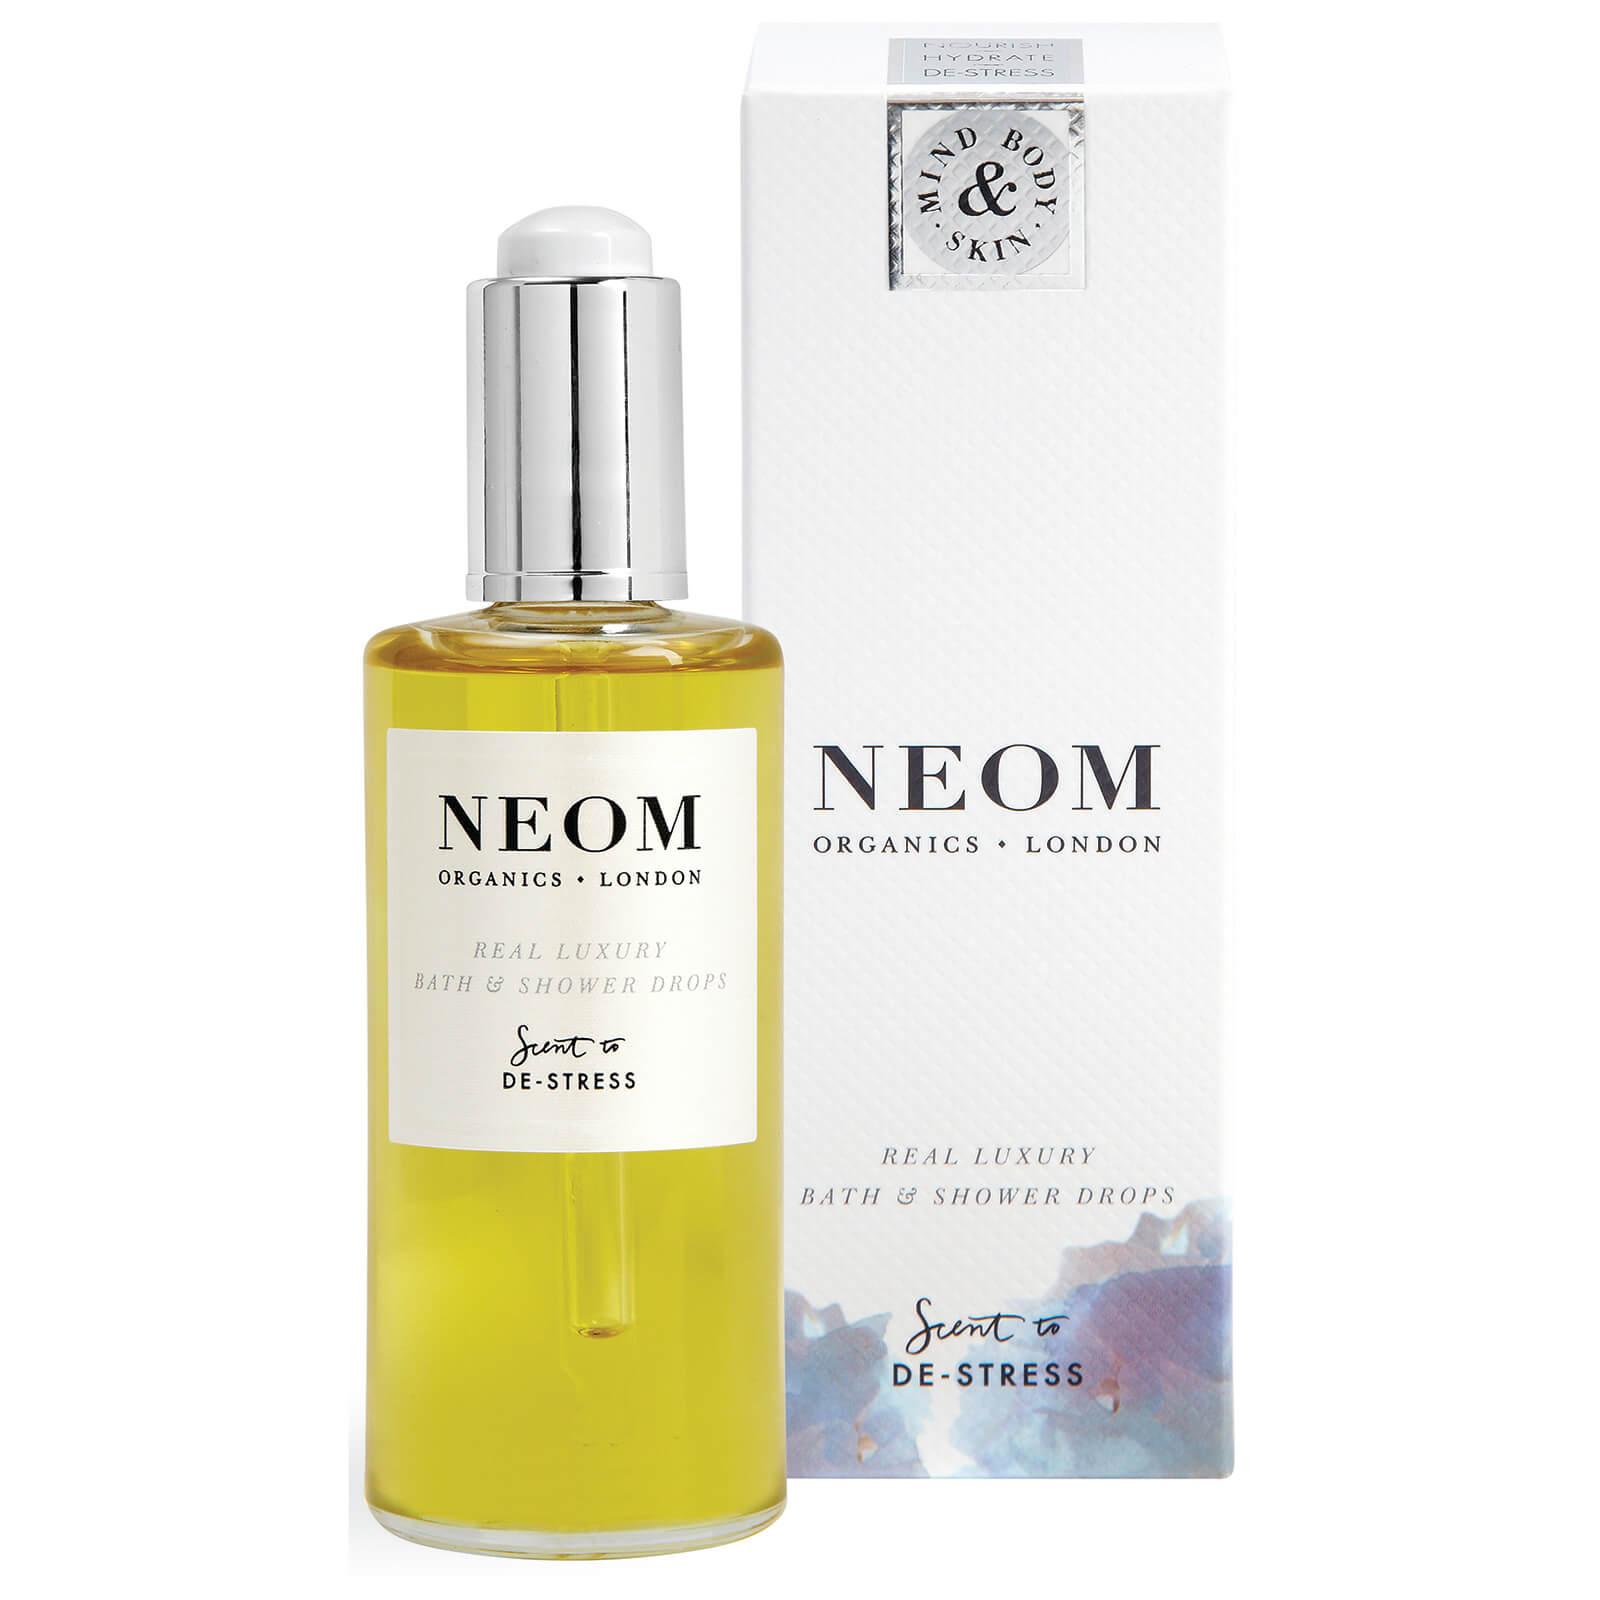 Neom Real Luxury Bath Shower Drops Beautyexpert Hippo Halter 05 Universal Mount Car Holder Mobil Black